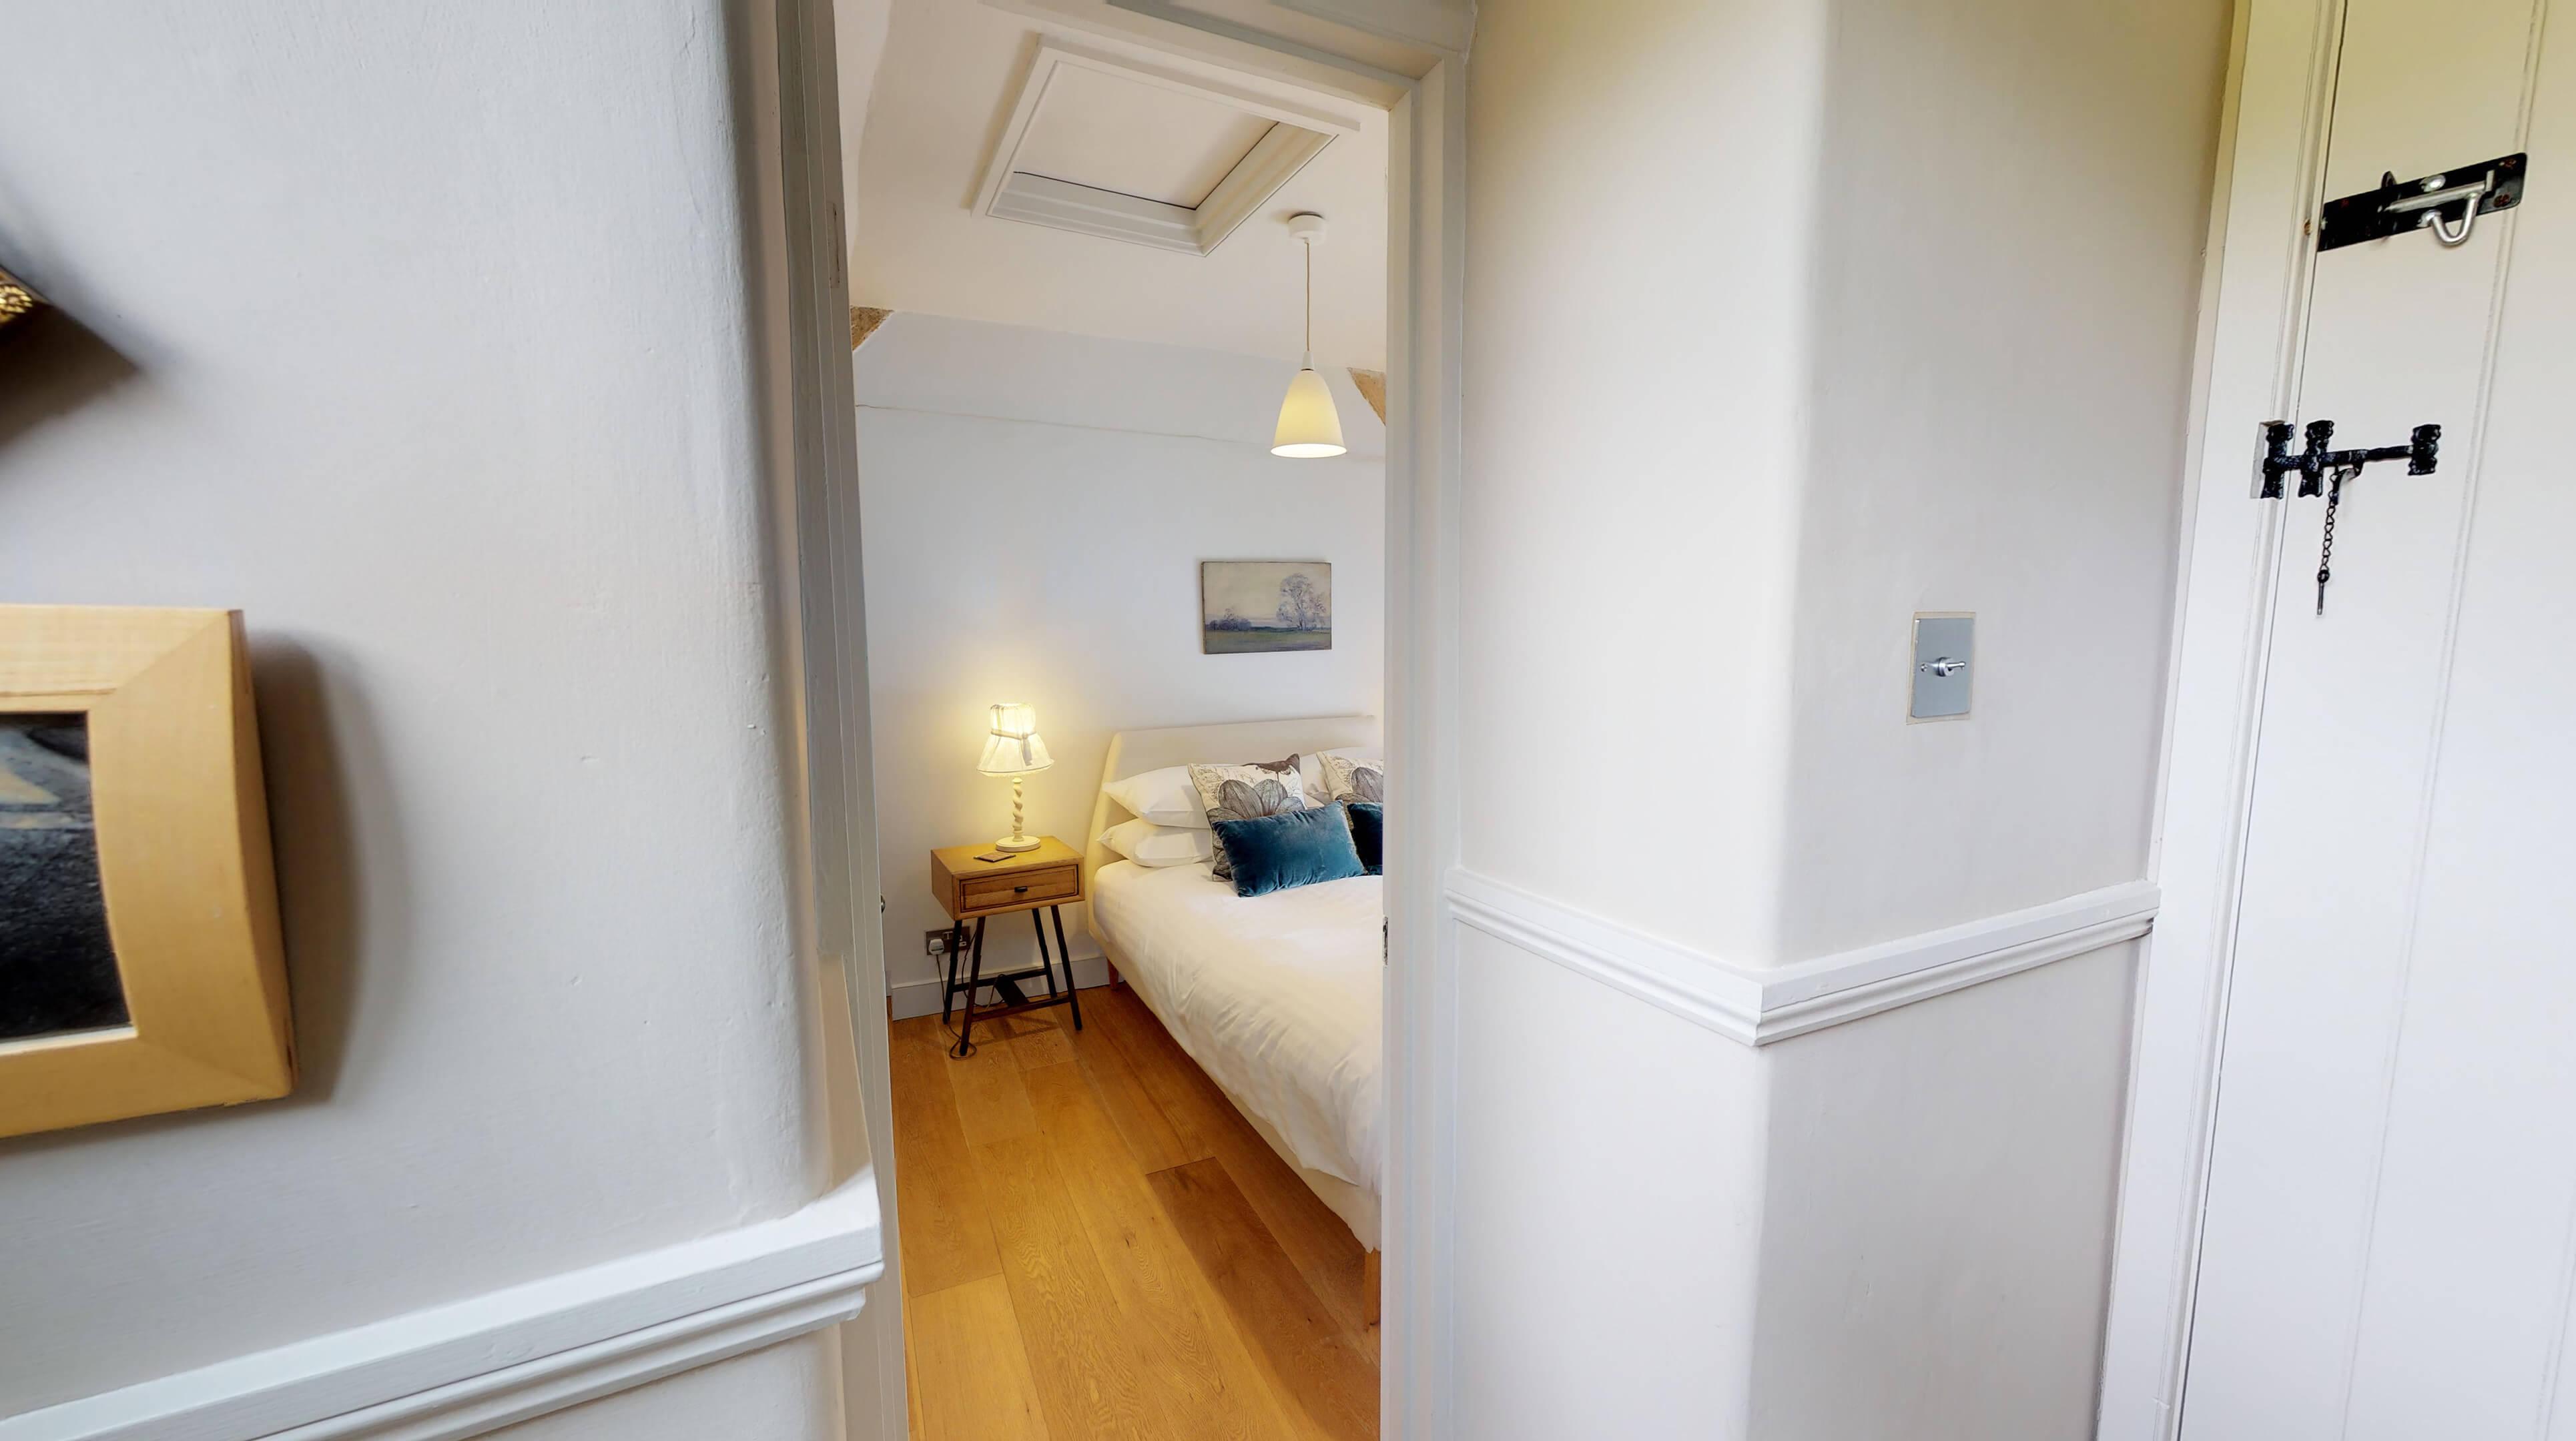 Lower Heyford Three Bedroom Coopers Cottage Bedroom One 5